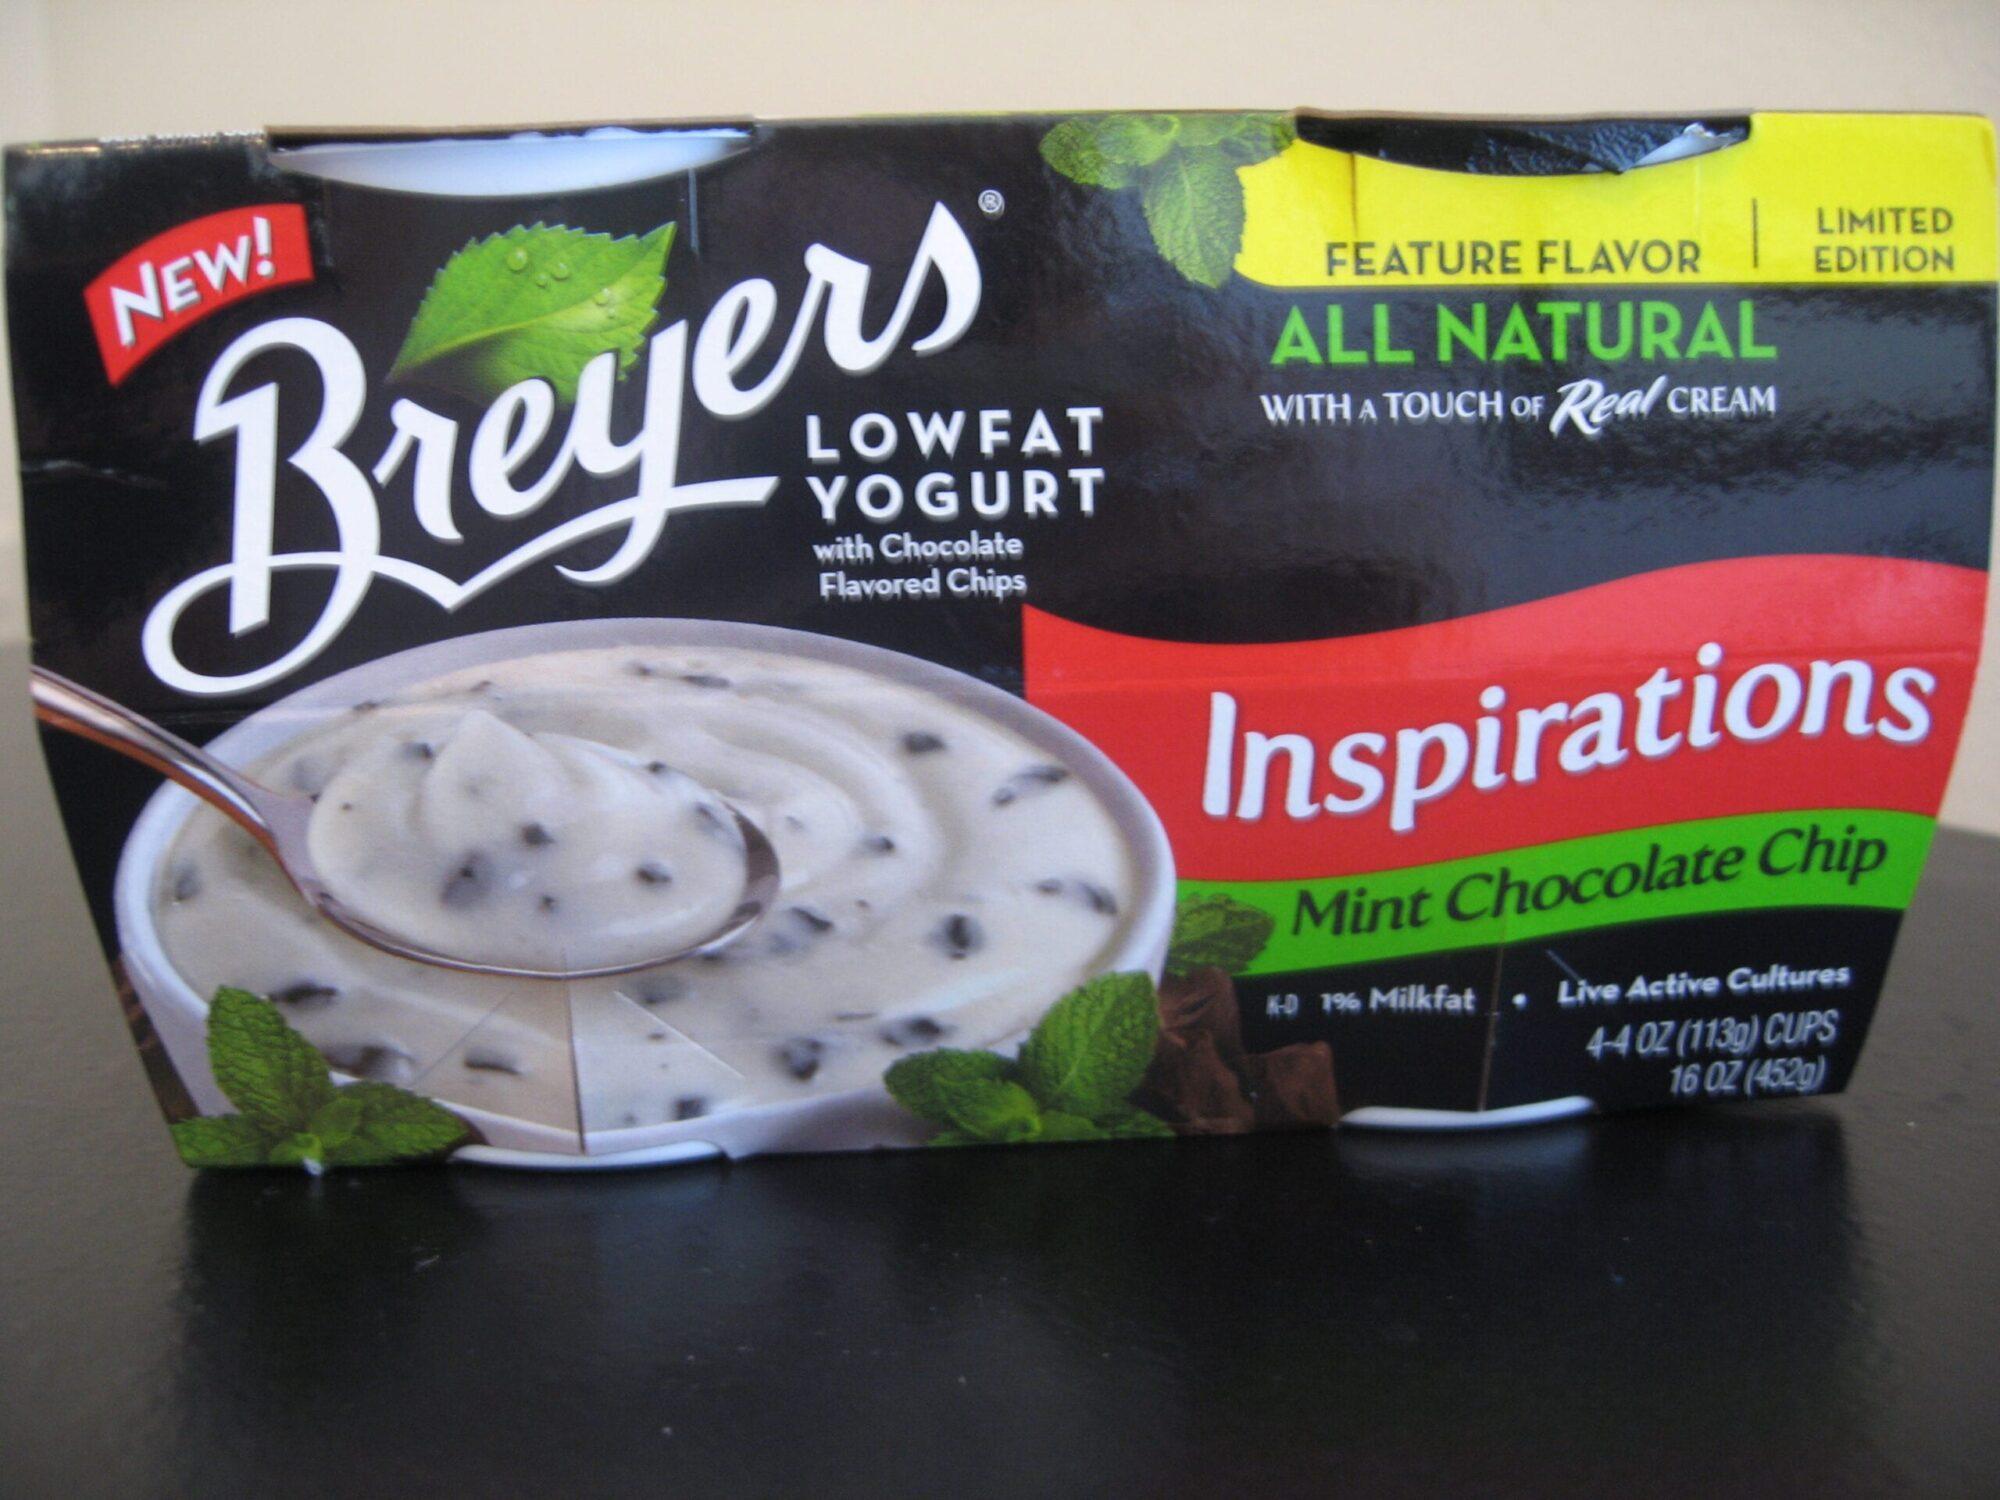 Mint Chocolate Chip Yogurt